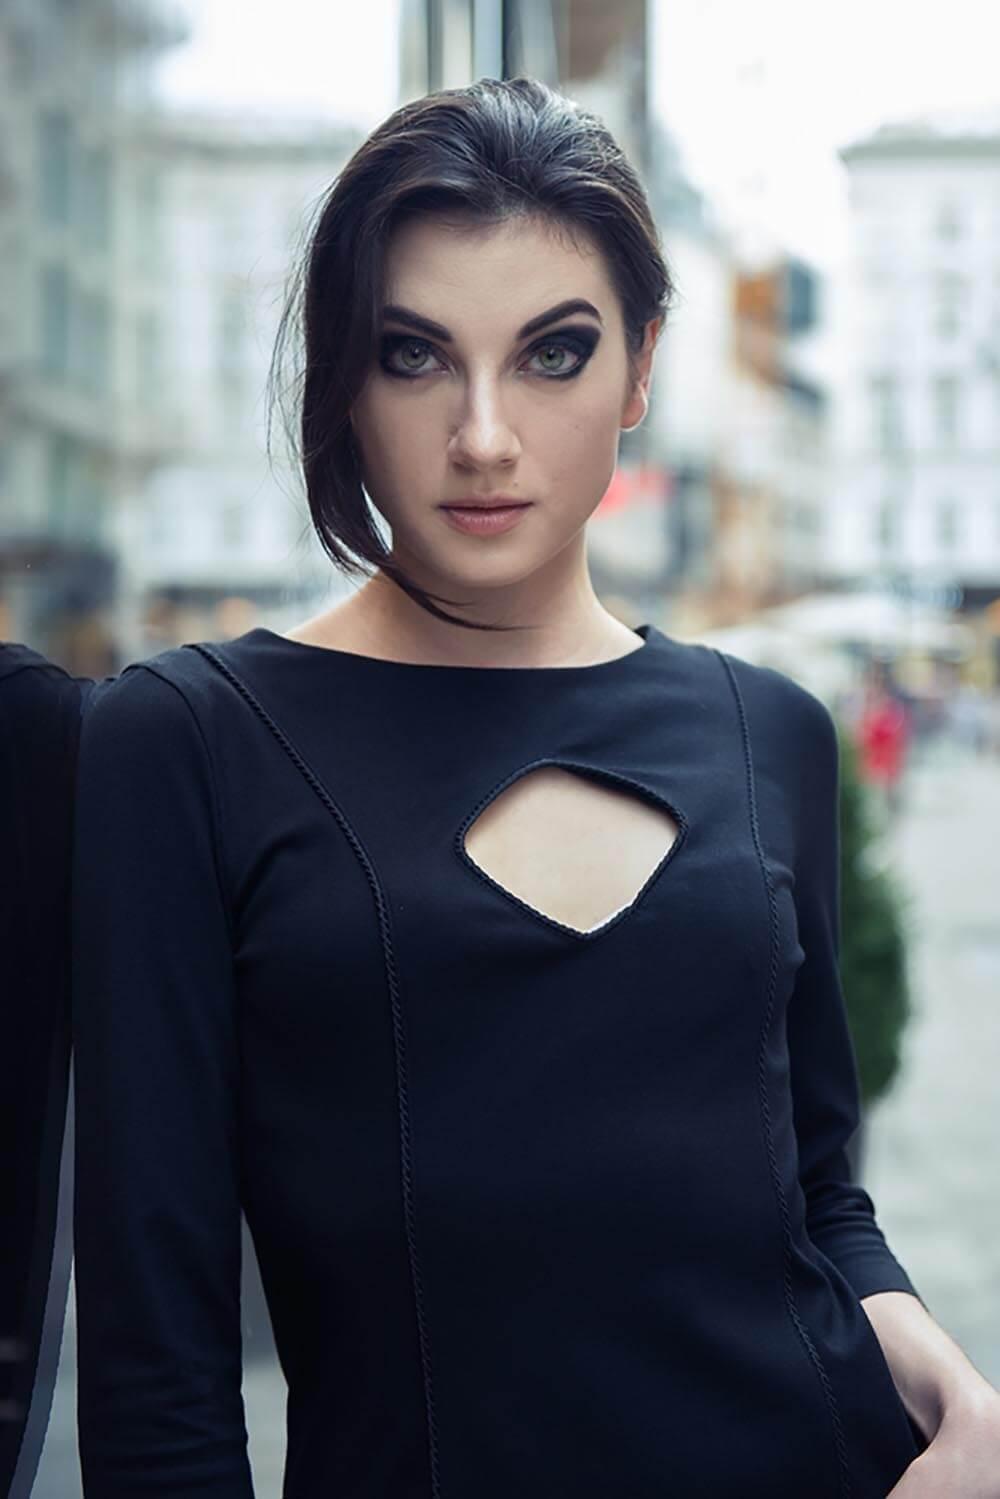 sophia grabner, Schauspiel, portrait, fotografie, ursula schmitz, ferman ab, Wien, classic hollywood,